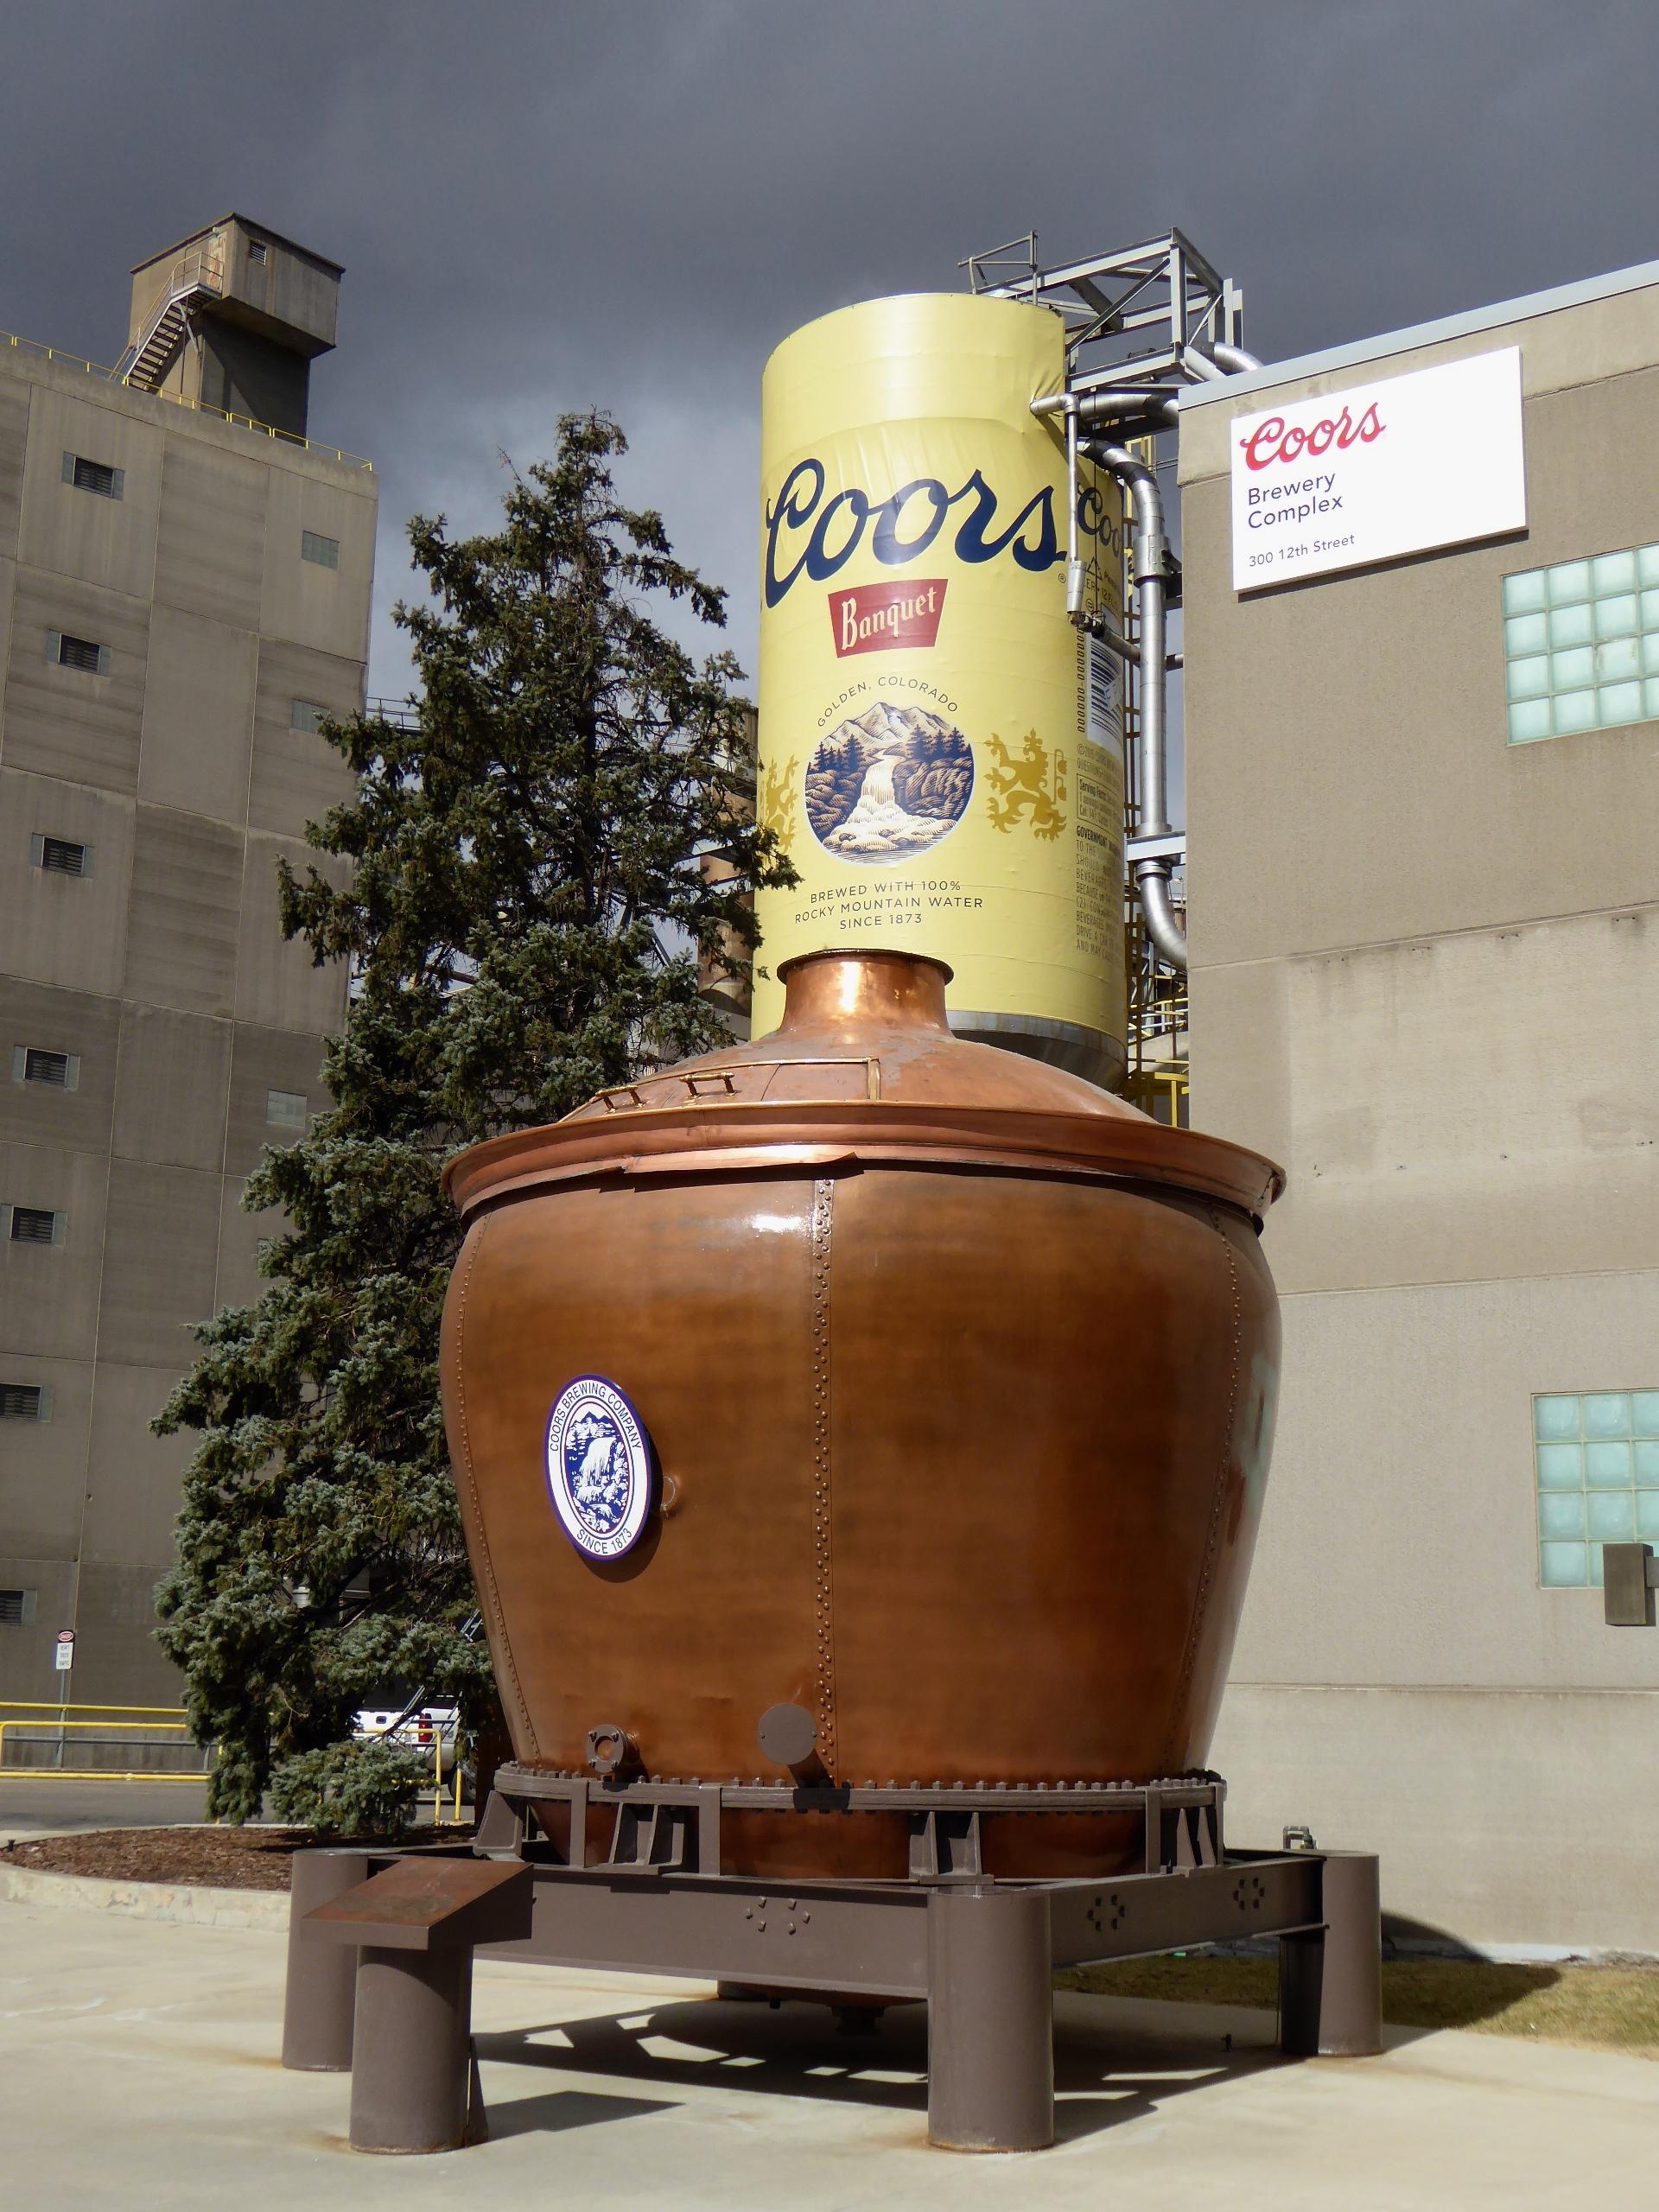 cindi_Coors_brewery_tour_spiritedtable_photo03.jpg